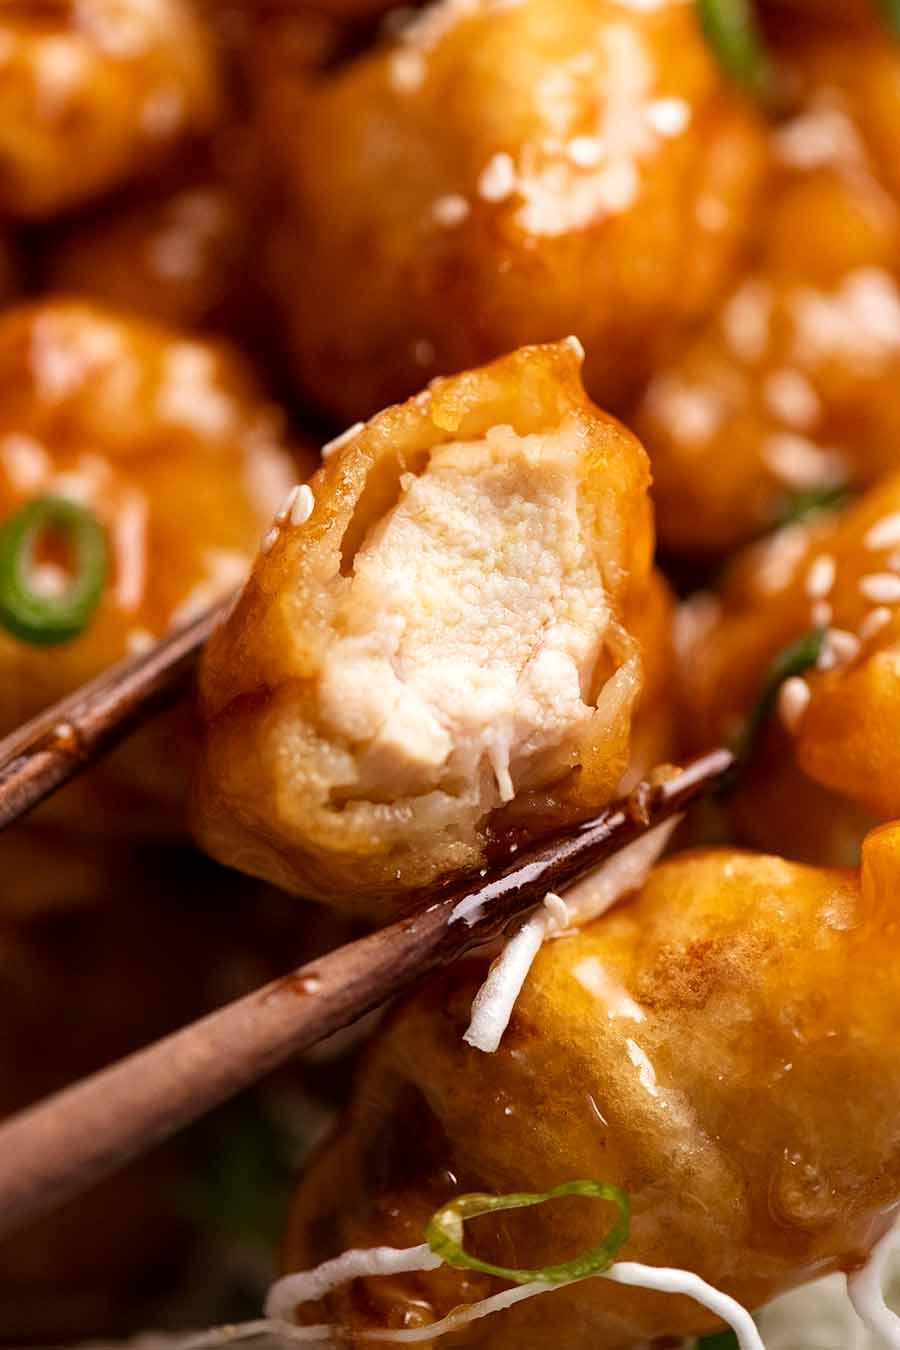 Close up showing inside of crispy Honey Chicken